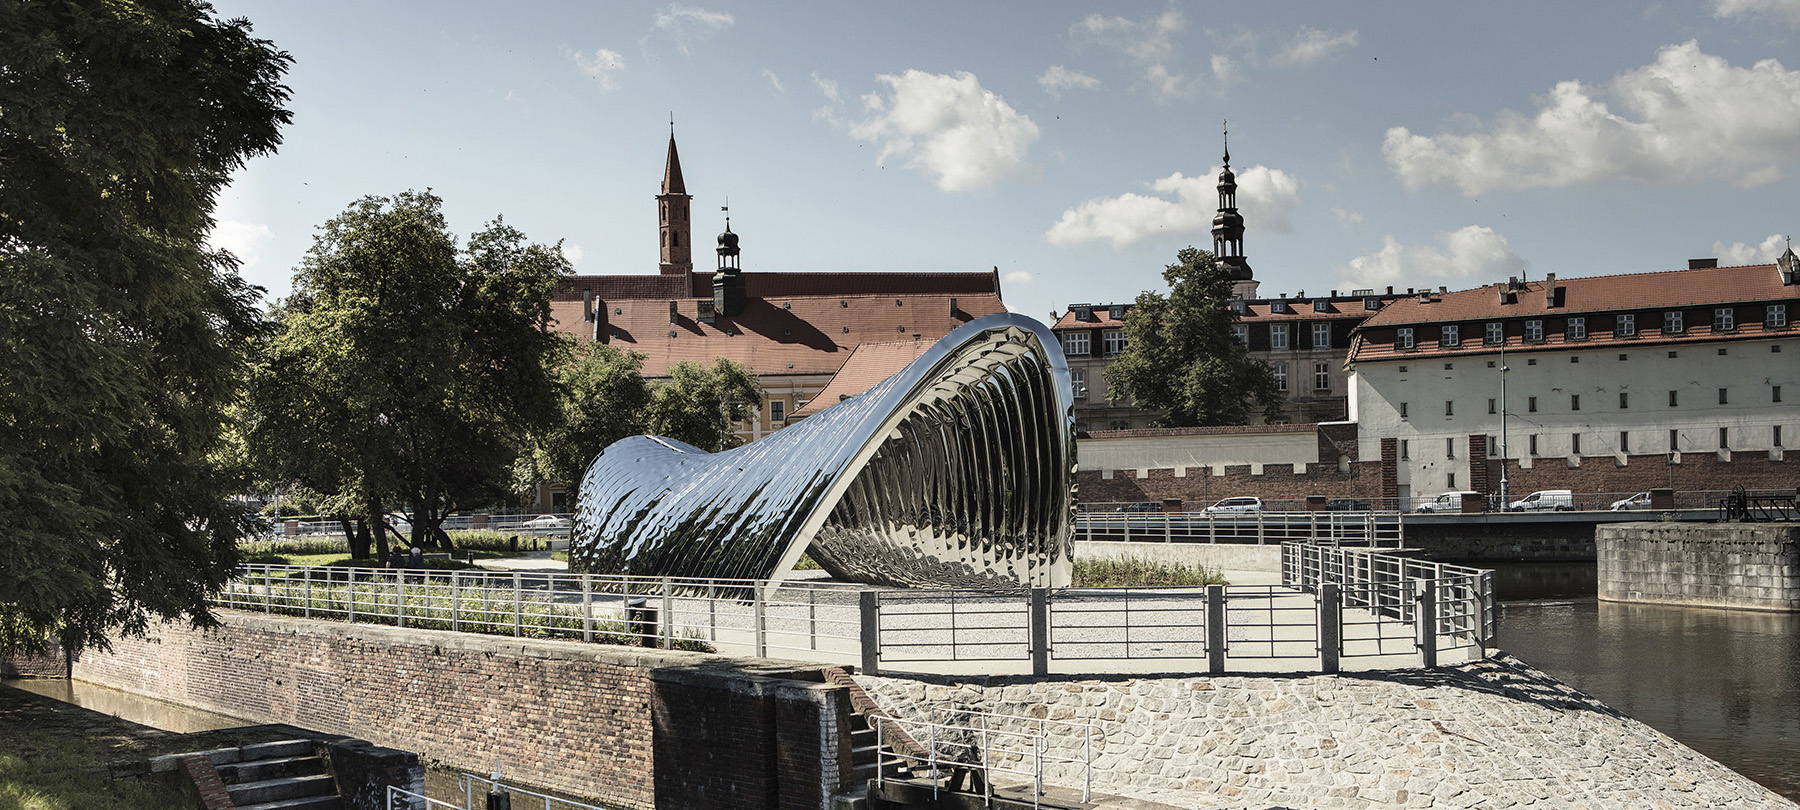 Nawa Public Sculpture Oskar Zieta